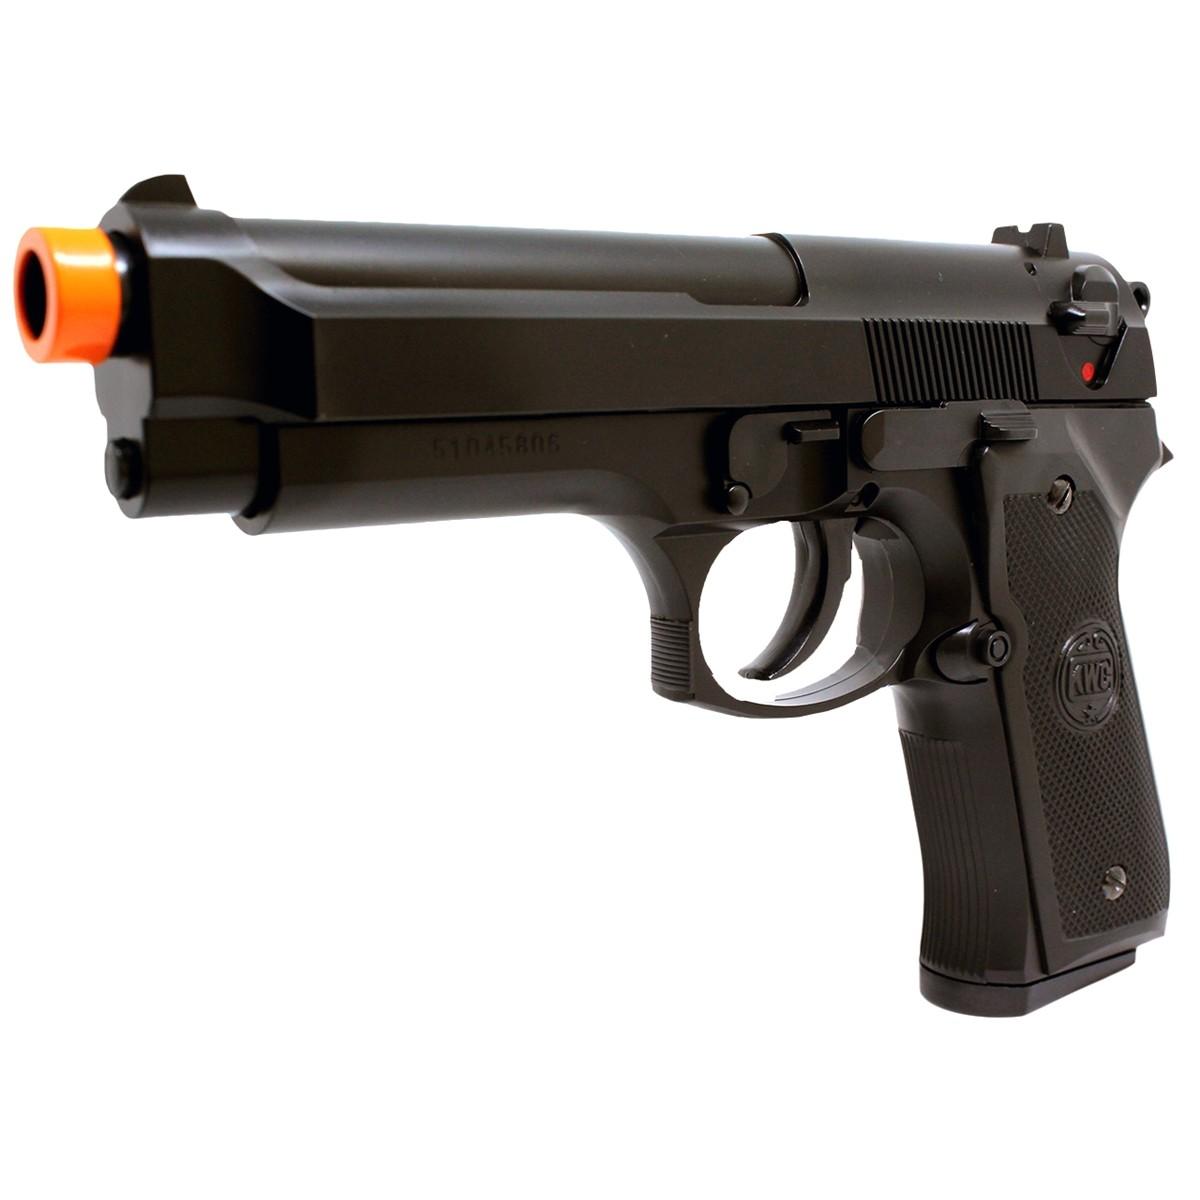 PISTOLA AIRSOFT BERETTA M92 SPRING - KWC